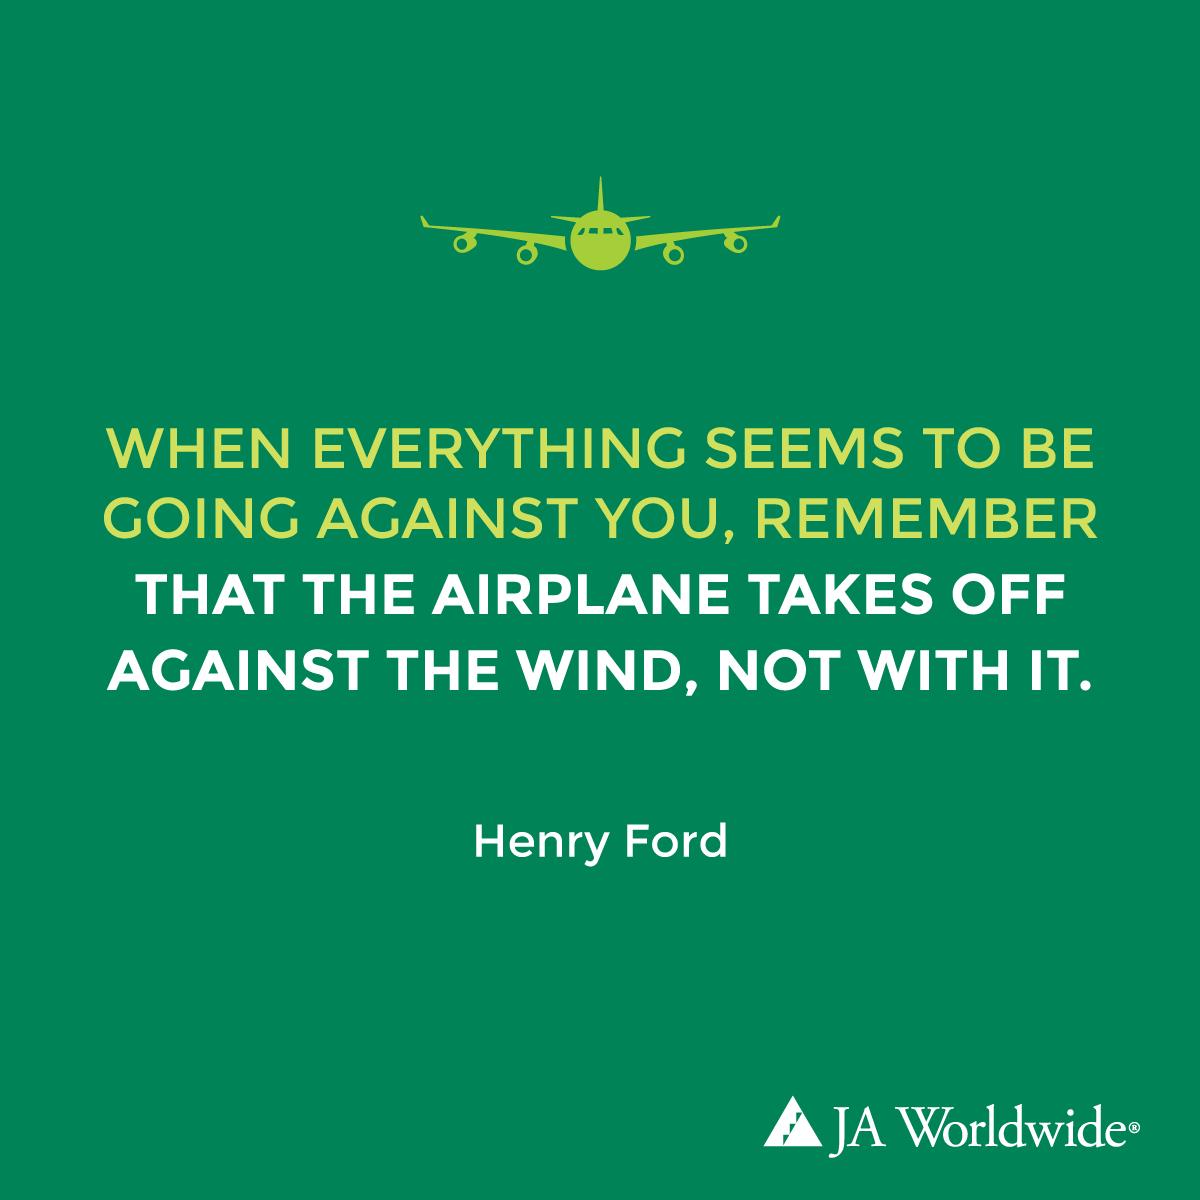 2016-03-07-Henry-Ford-airplane.jpg